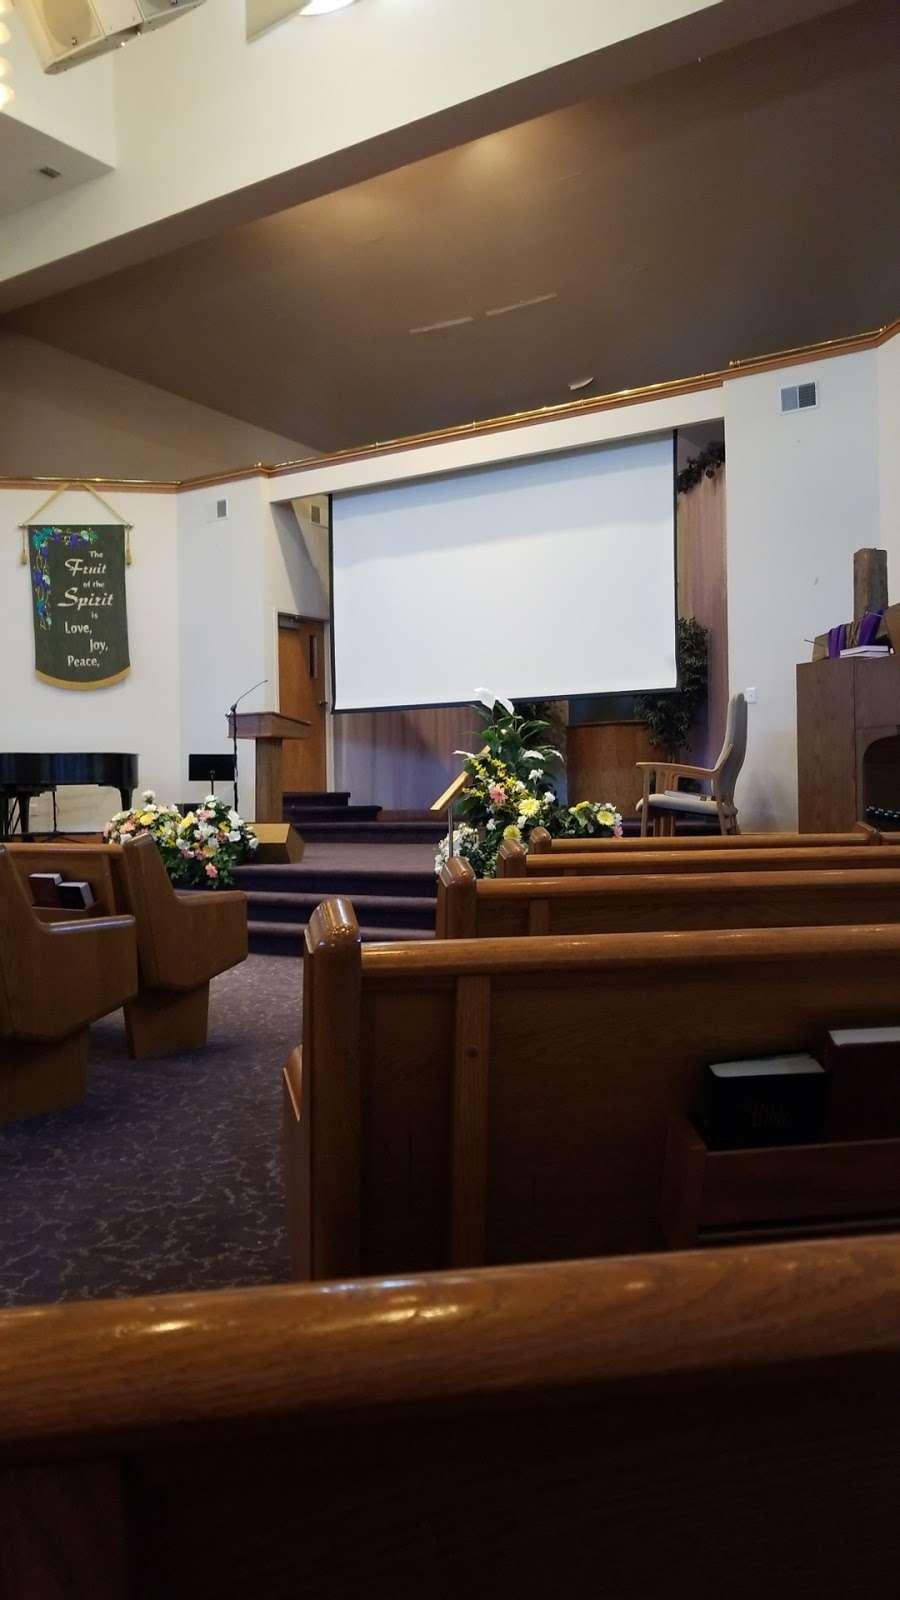 Robbinsville Seventh-Day Adventist Community Church - church    Photo 5 of 10   Address: 2314 NJ-33, Robbinsville, NJ 08691, USA   Phone: (609) 259-6868